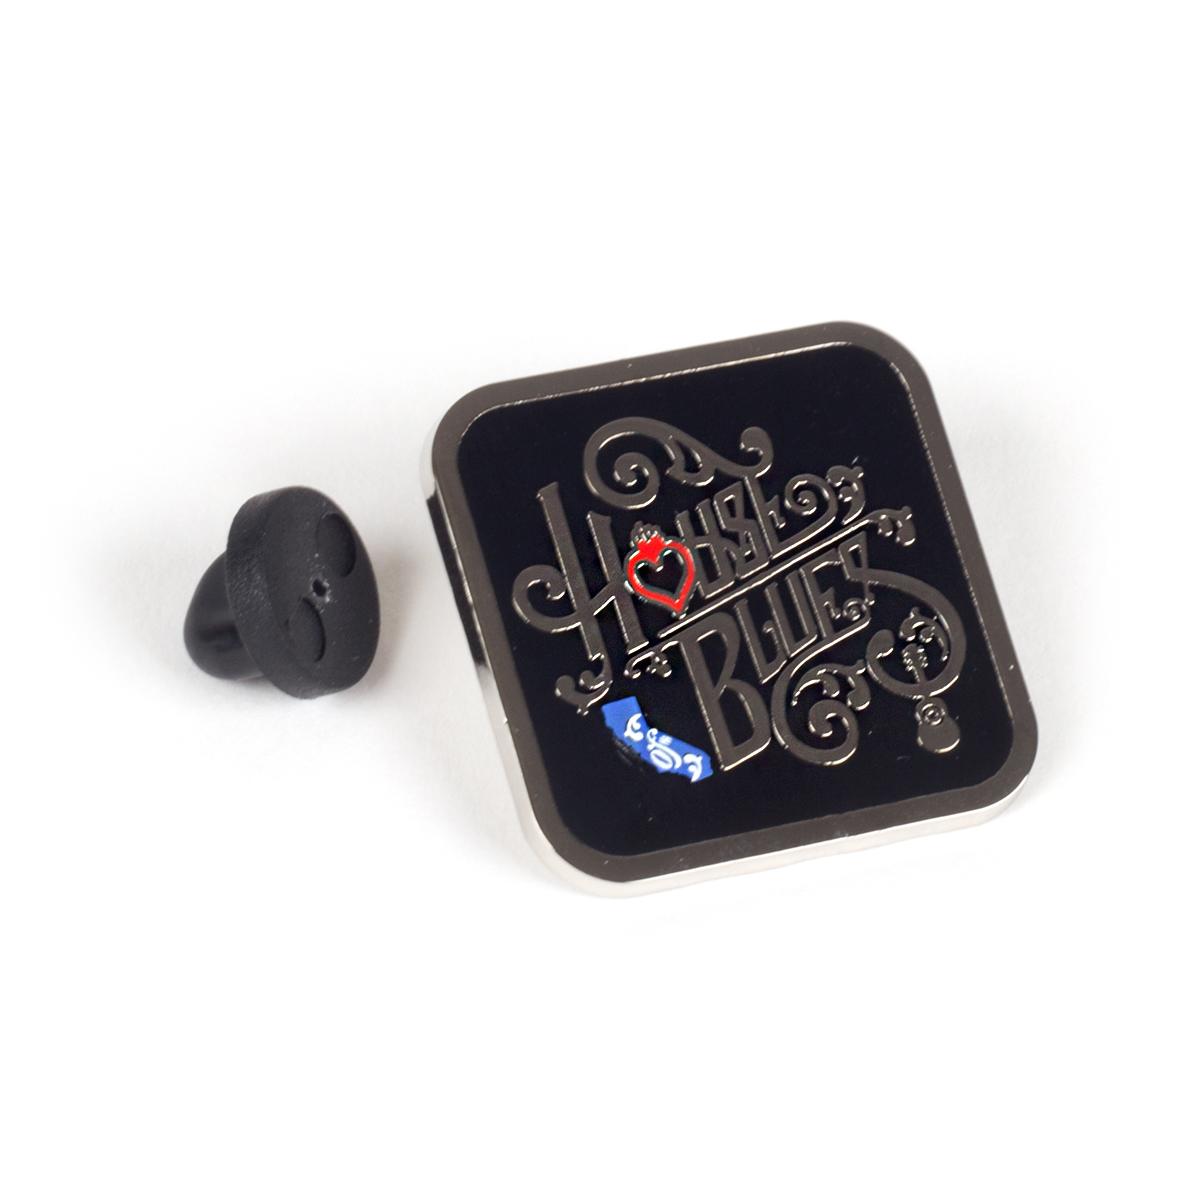 Square Home Pin